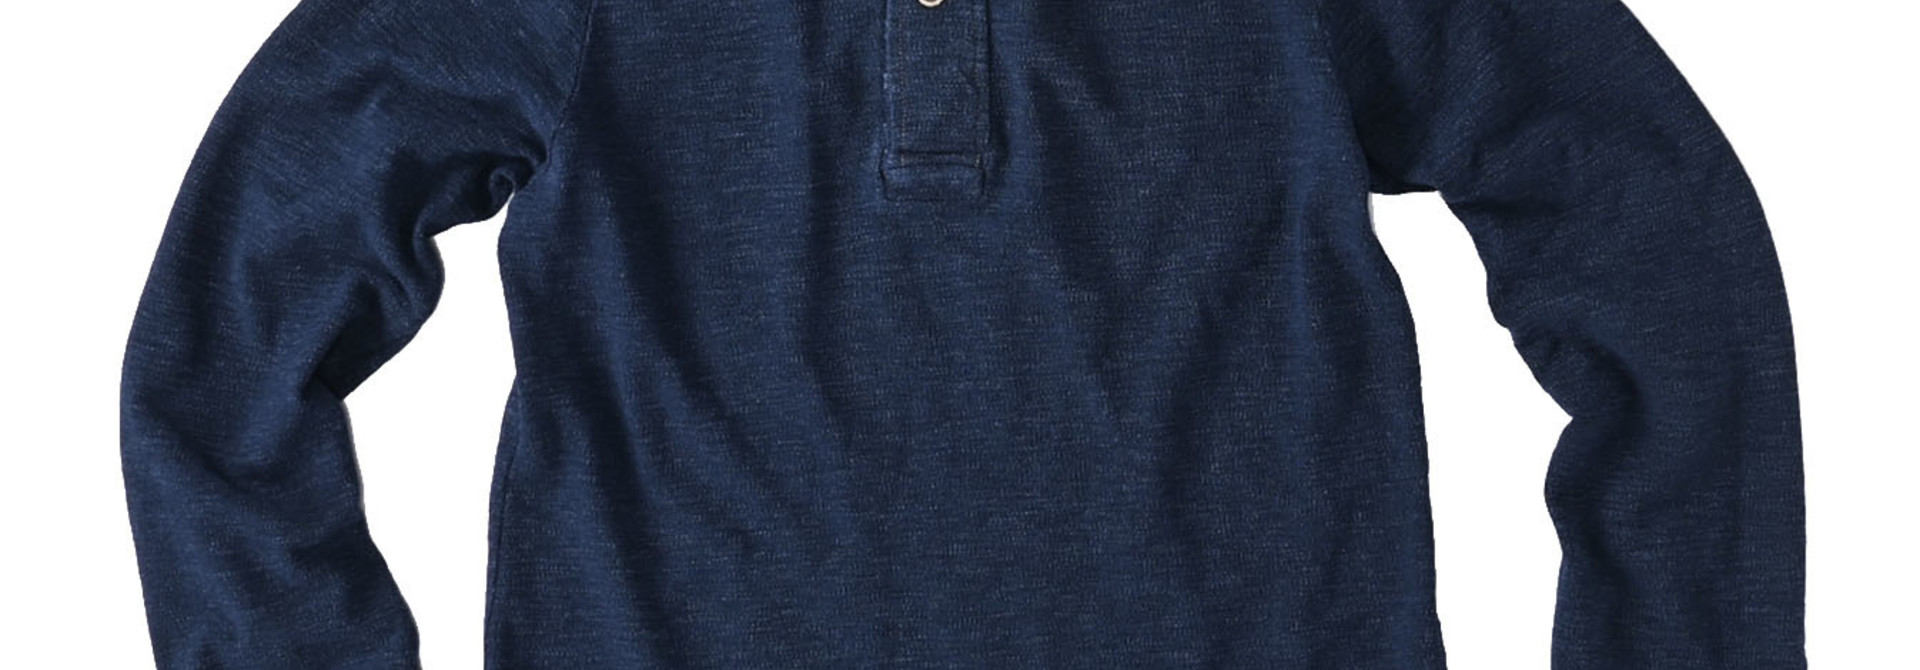 Indigo Kanoko Shiokaze Long-sleeved Square Polo Shirt (0521)